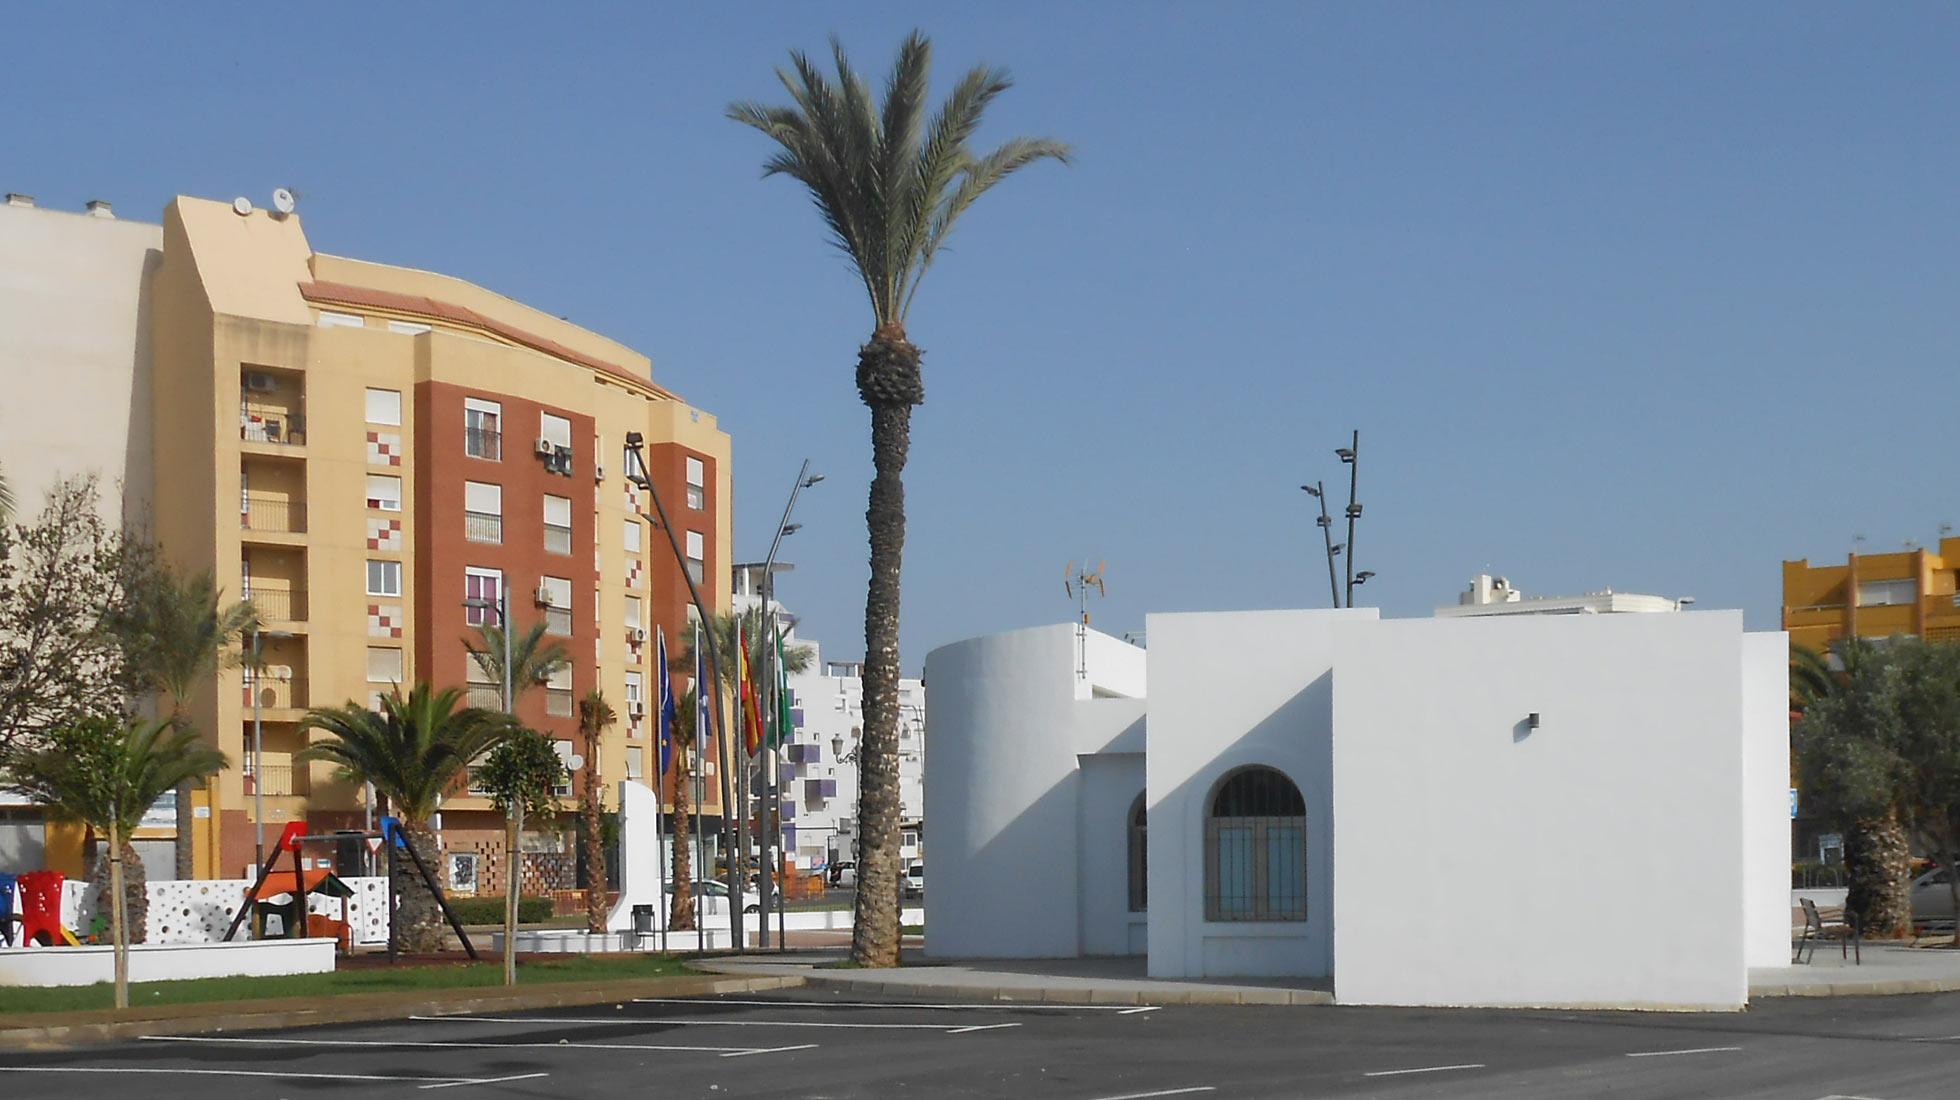 Oficina municipal de turismo en roquetas de mar js for Oficina municipal de turismo